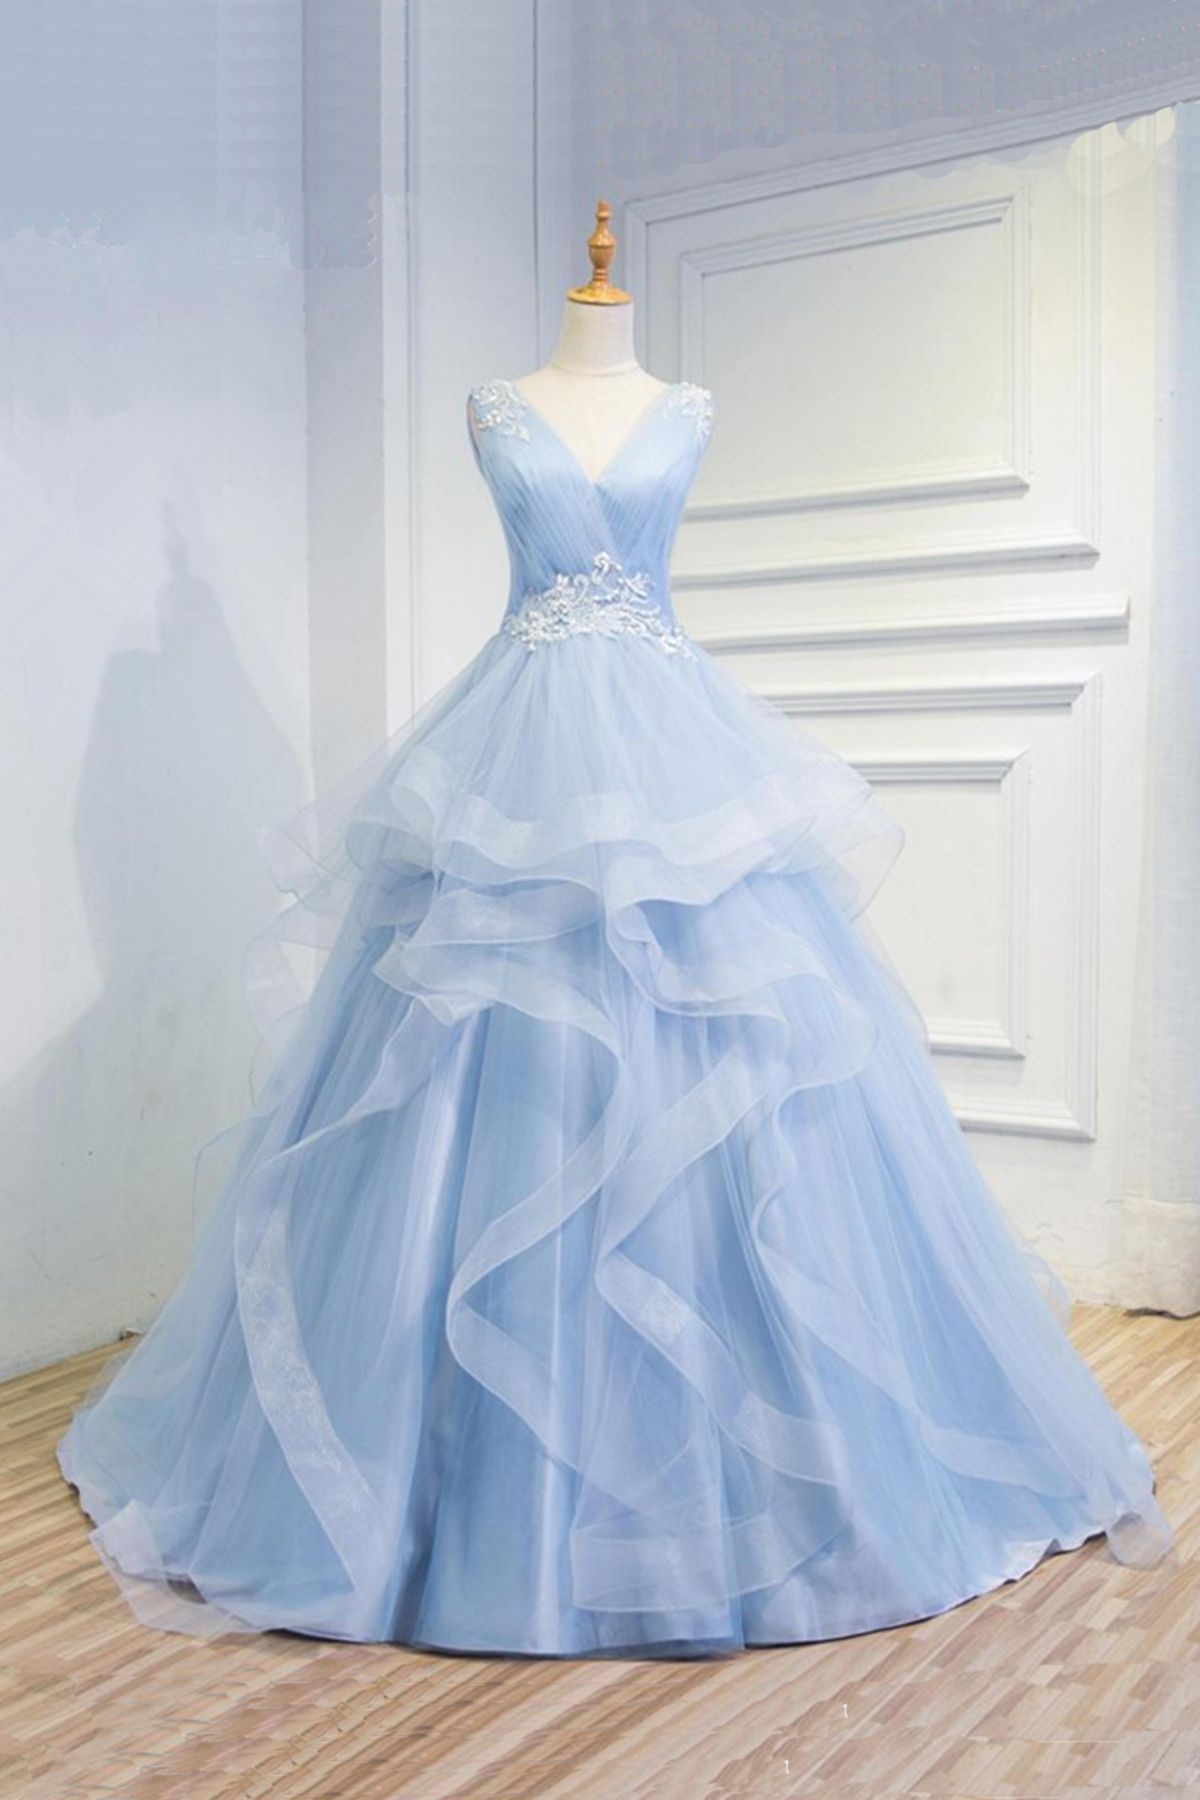 New design baby blue organza prom dress, ball gowns wedding dress ...